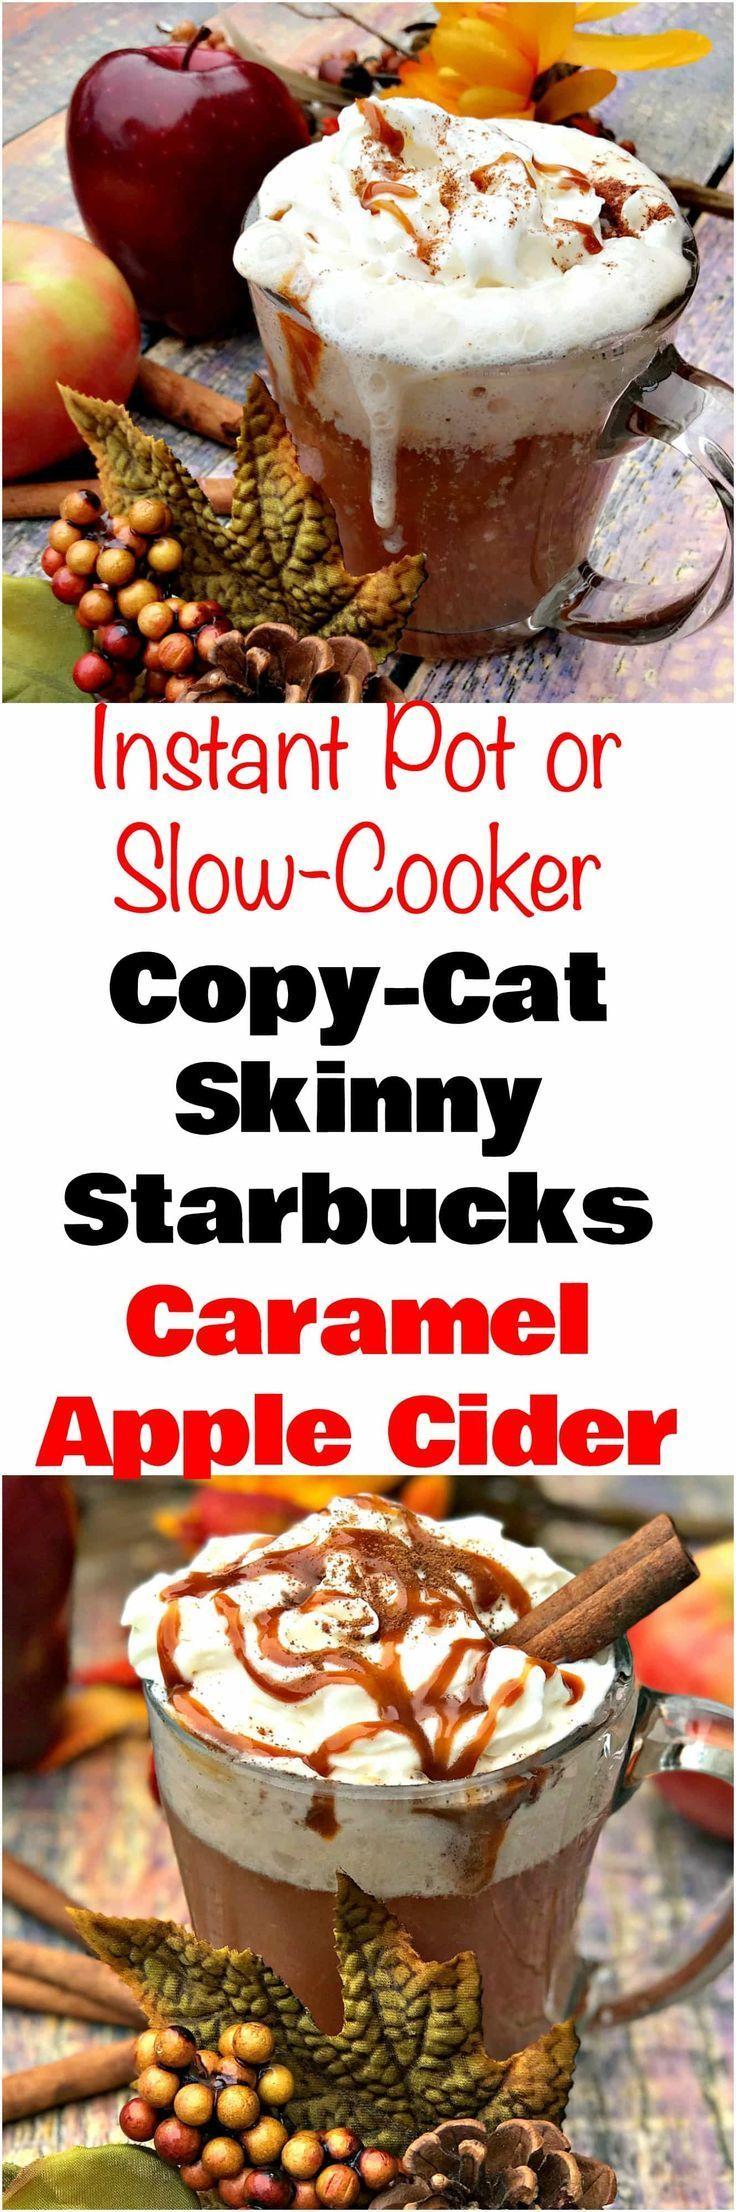 Instant Pot SlowCooker Skinny CopyCat Starbucks Apple